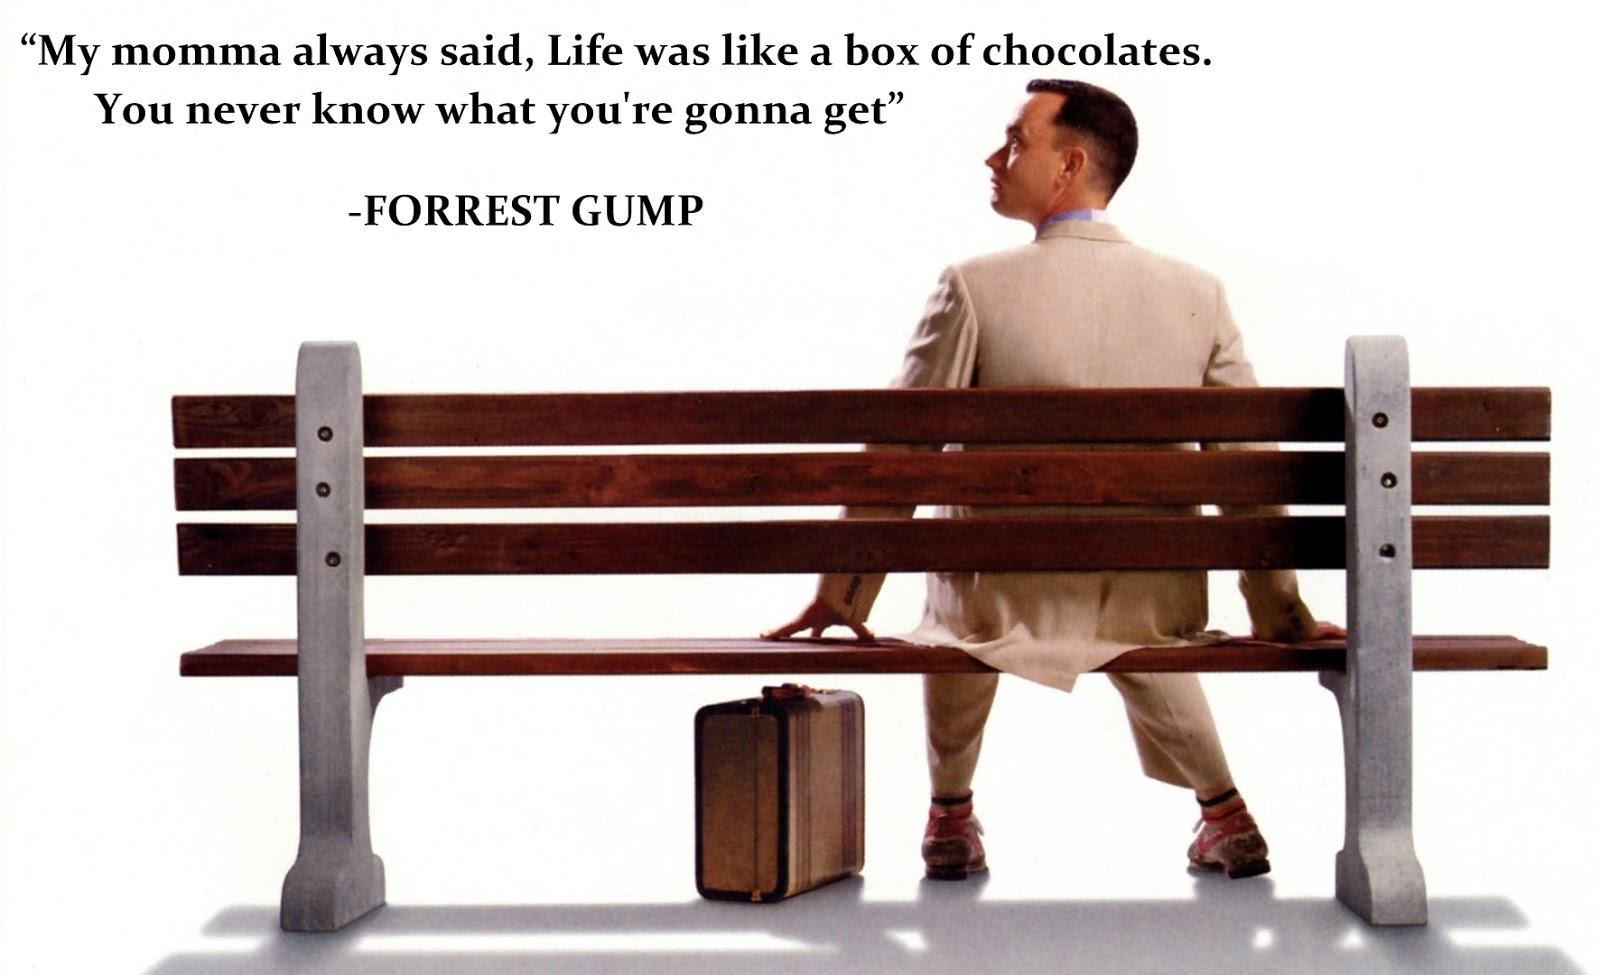 https://4.bp.blogspot.com/-H7uSo4DIm2U/UY7Avij6MdI/AAAAAAAAALY/r_eqVrykKfo/s1600/Forrest-Gump-Tom-Hanks-Bench-Suit-Suitcase-+-+Copy.jpg